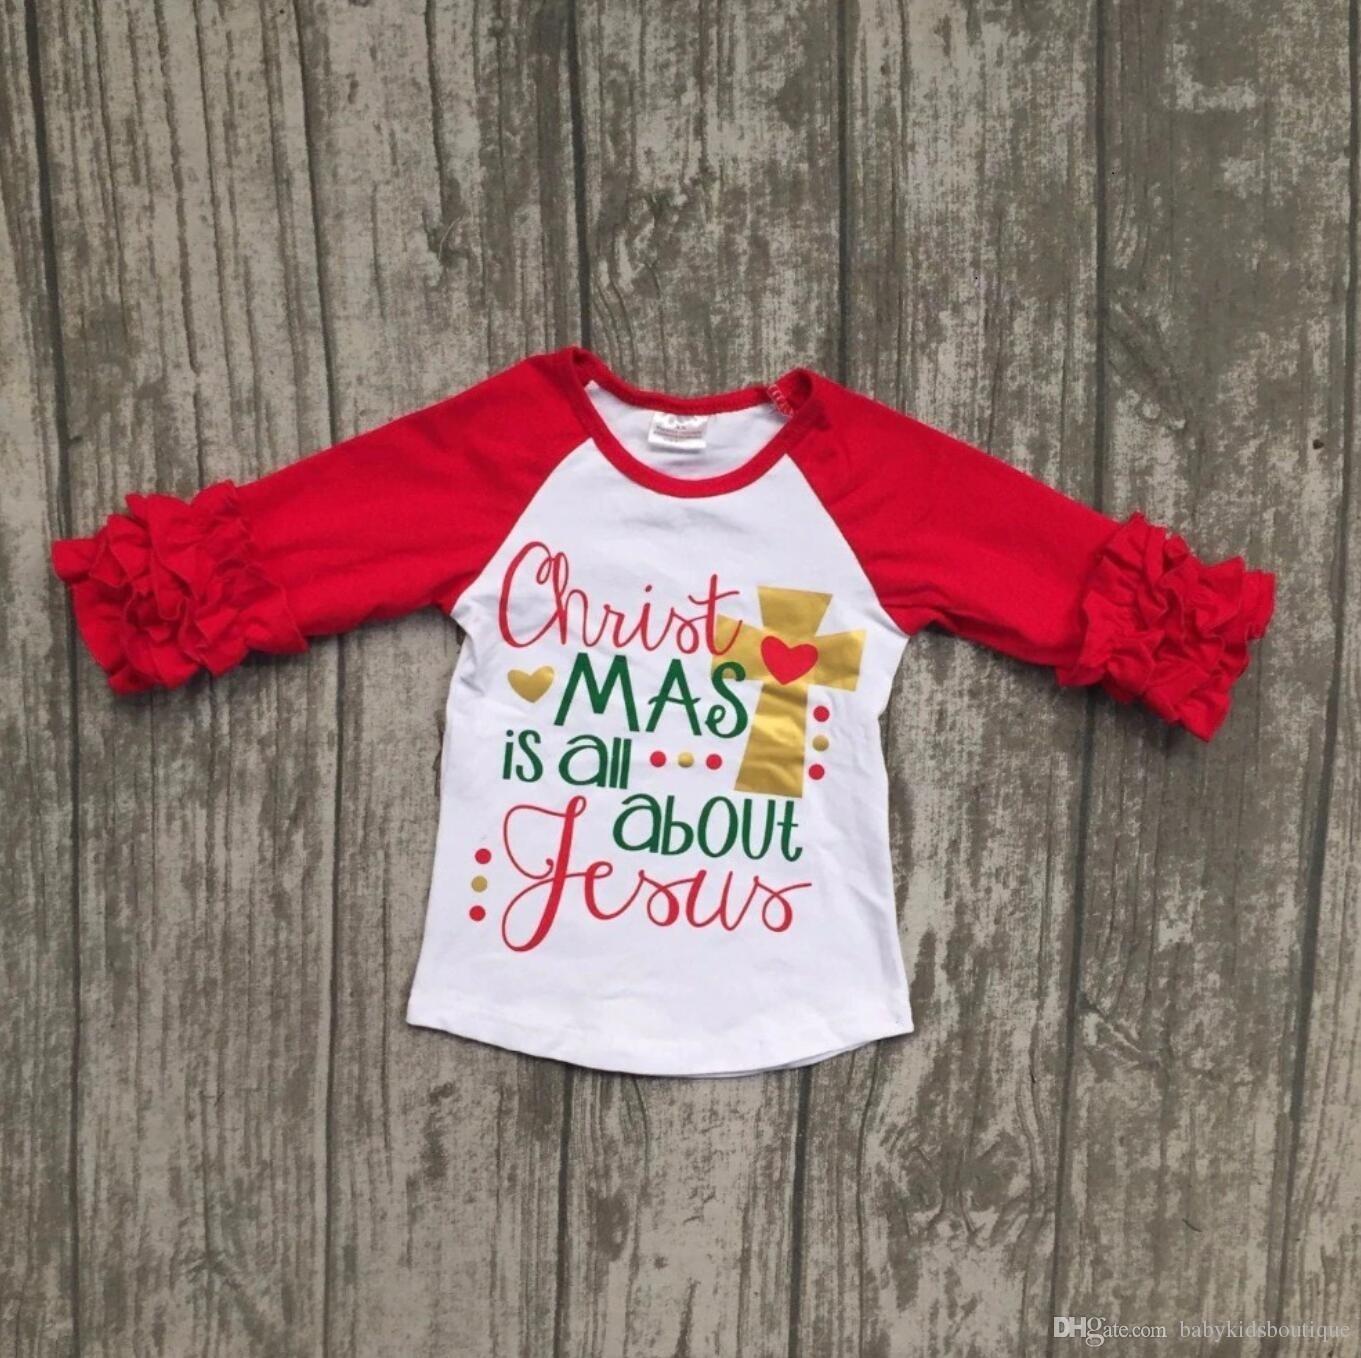 663c3756cb9f 2019 New Baby Girls Christmas Raglan Sleeves T Shirt Toddler Kids Red And  Dot Ruffle Top Fashion Kids Christmas Shirt From Babykidsboutique, $7.84 |  DHgate.